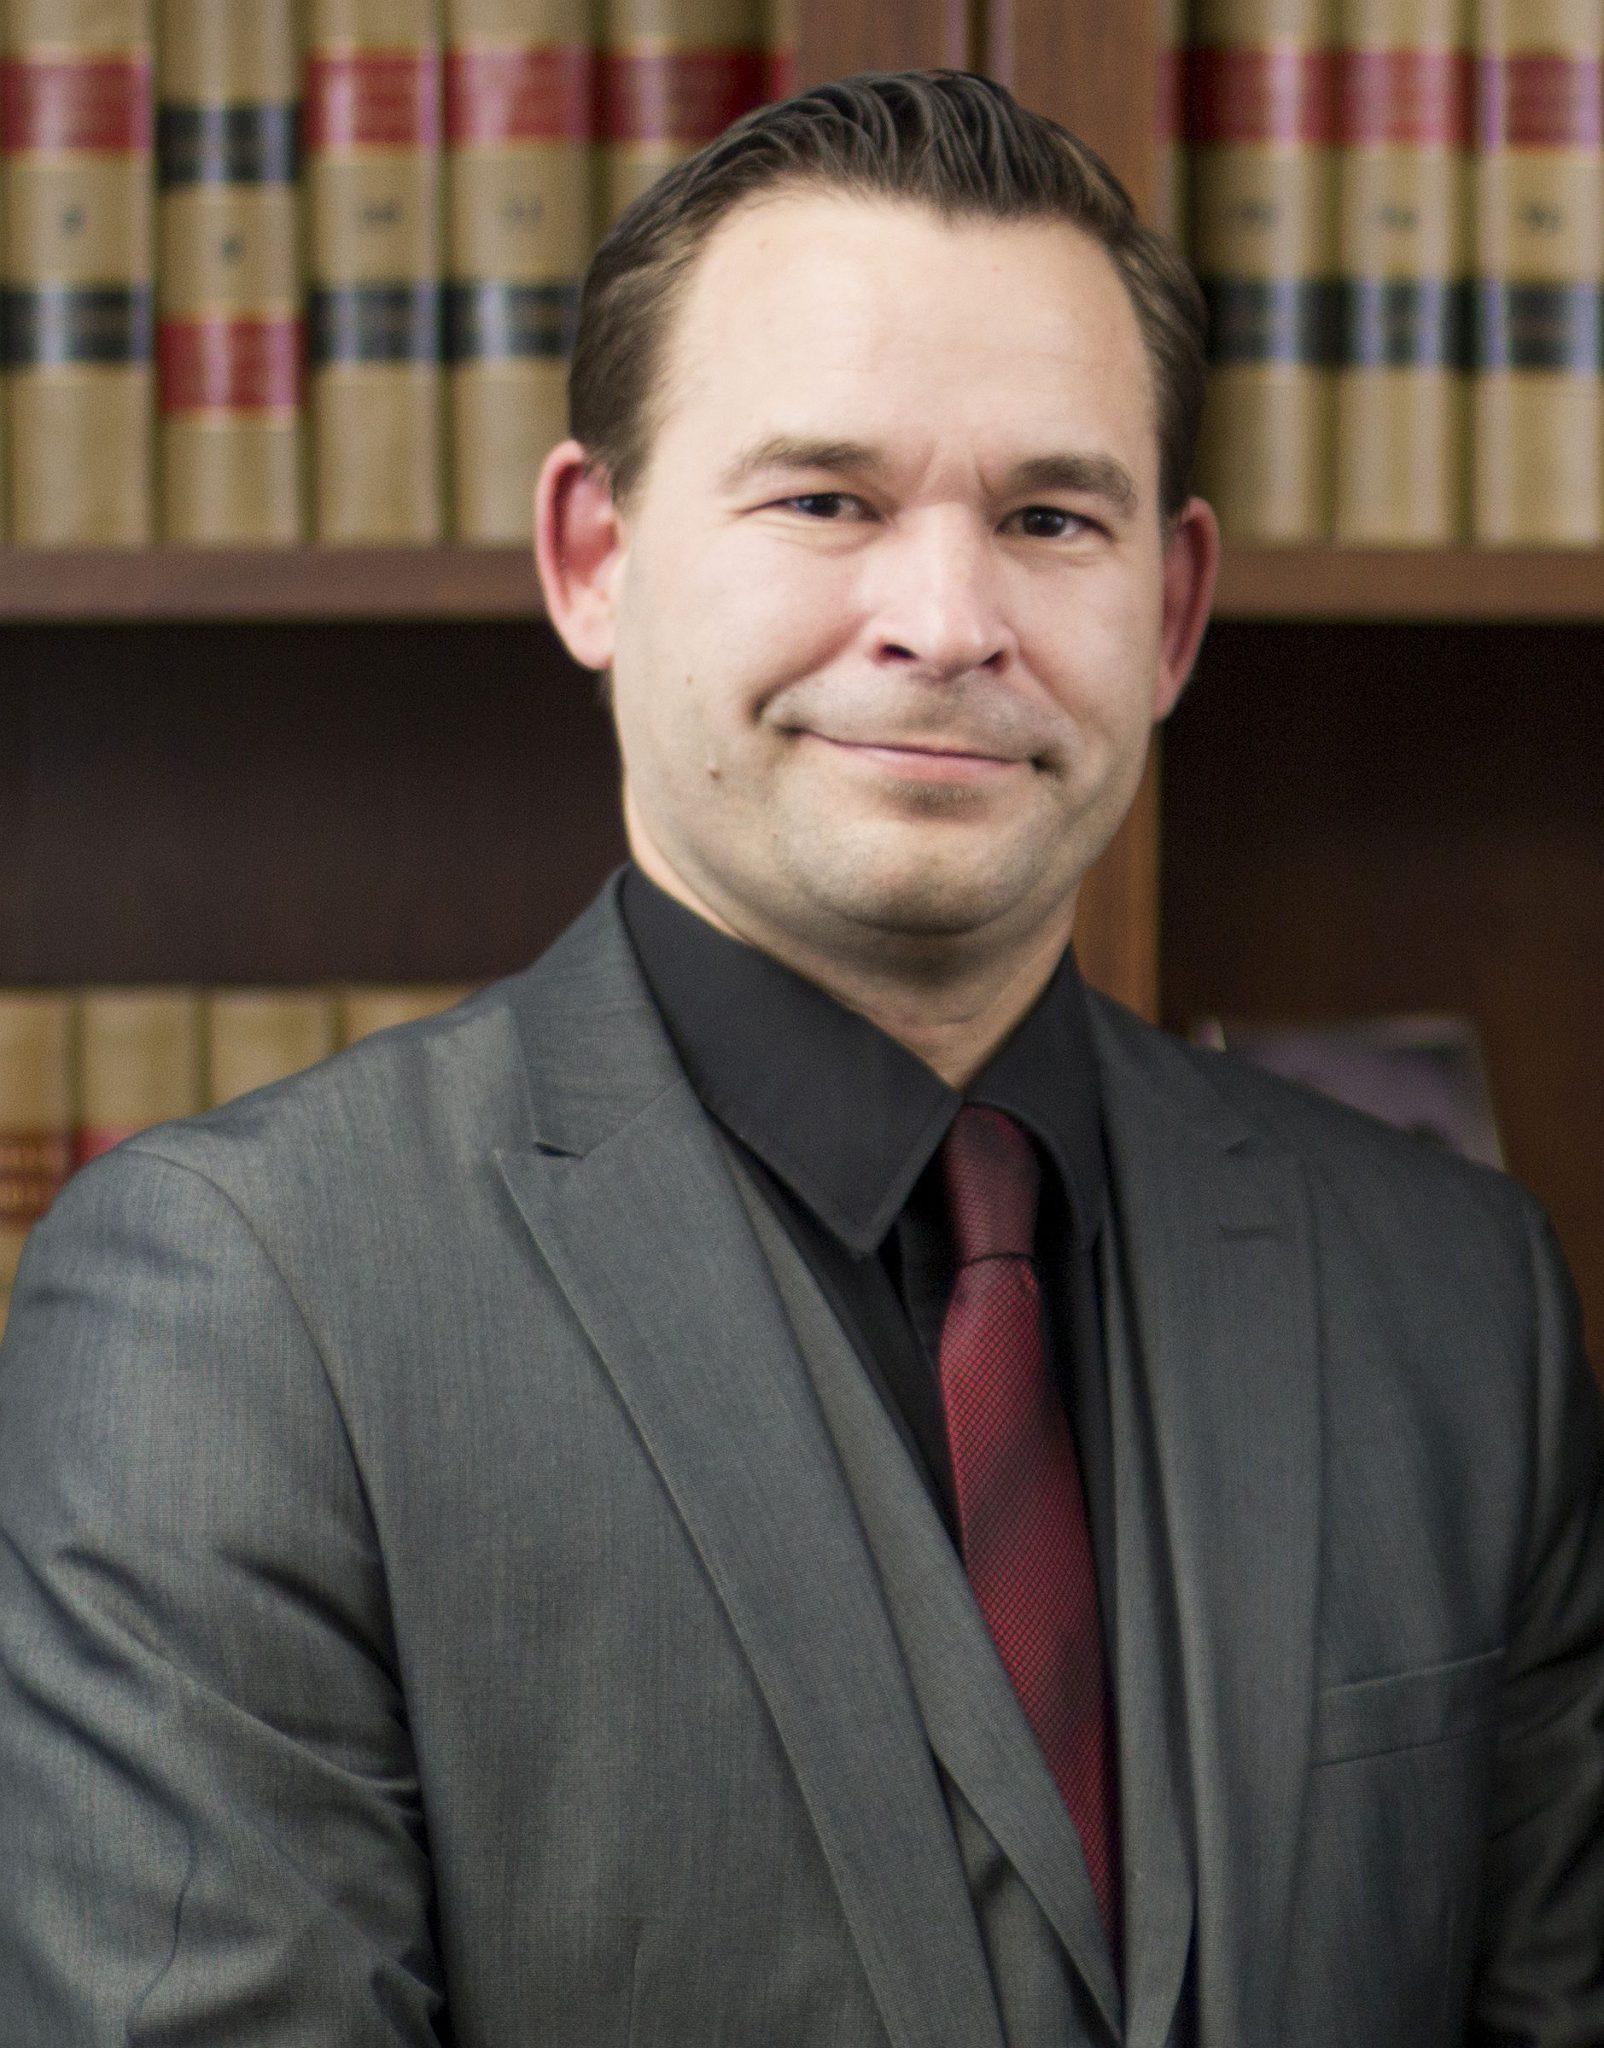 Richard M. Delzeith